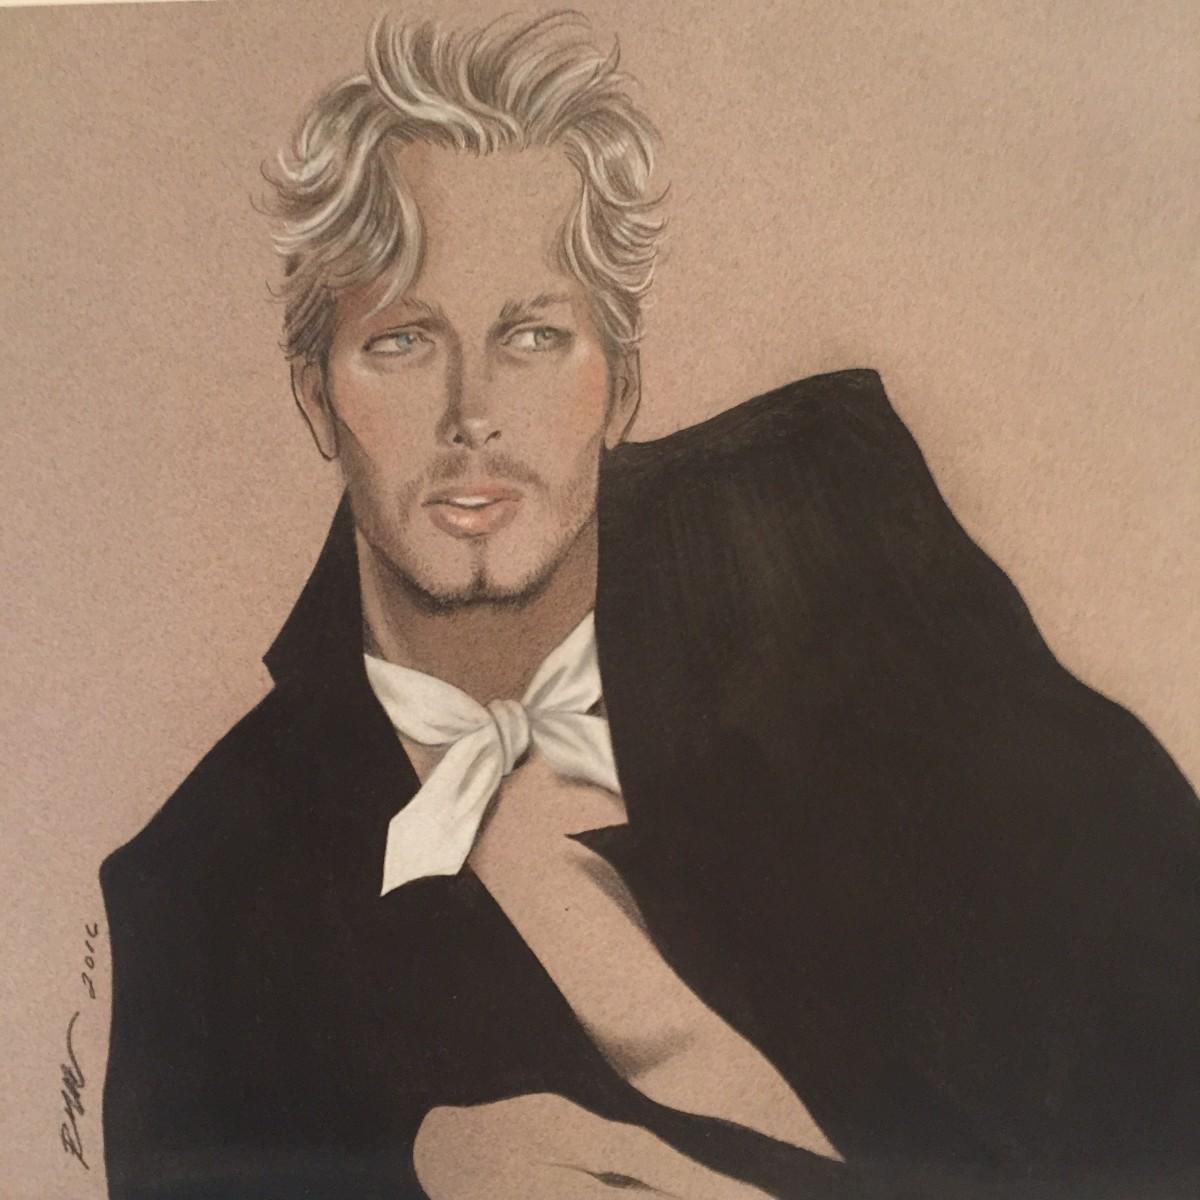 A Robert W. Richards illustration of Eric Daman. Photo: Robert W. Richards/Courtesy Eric Daman